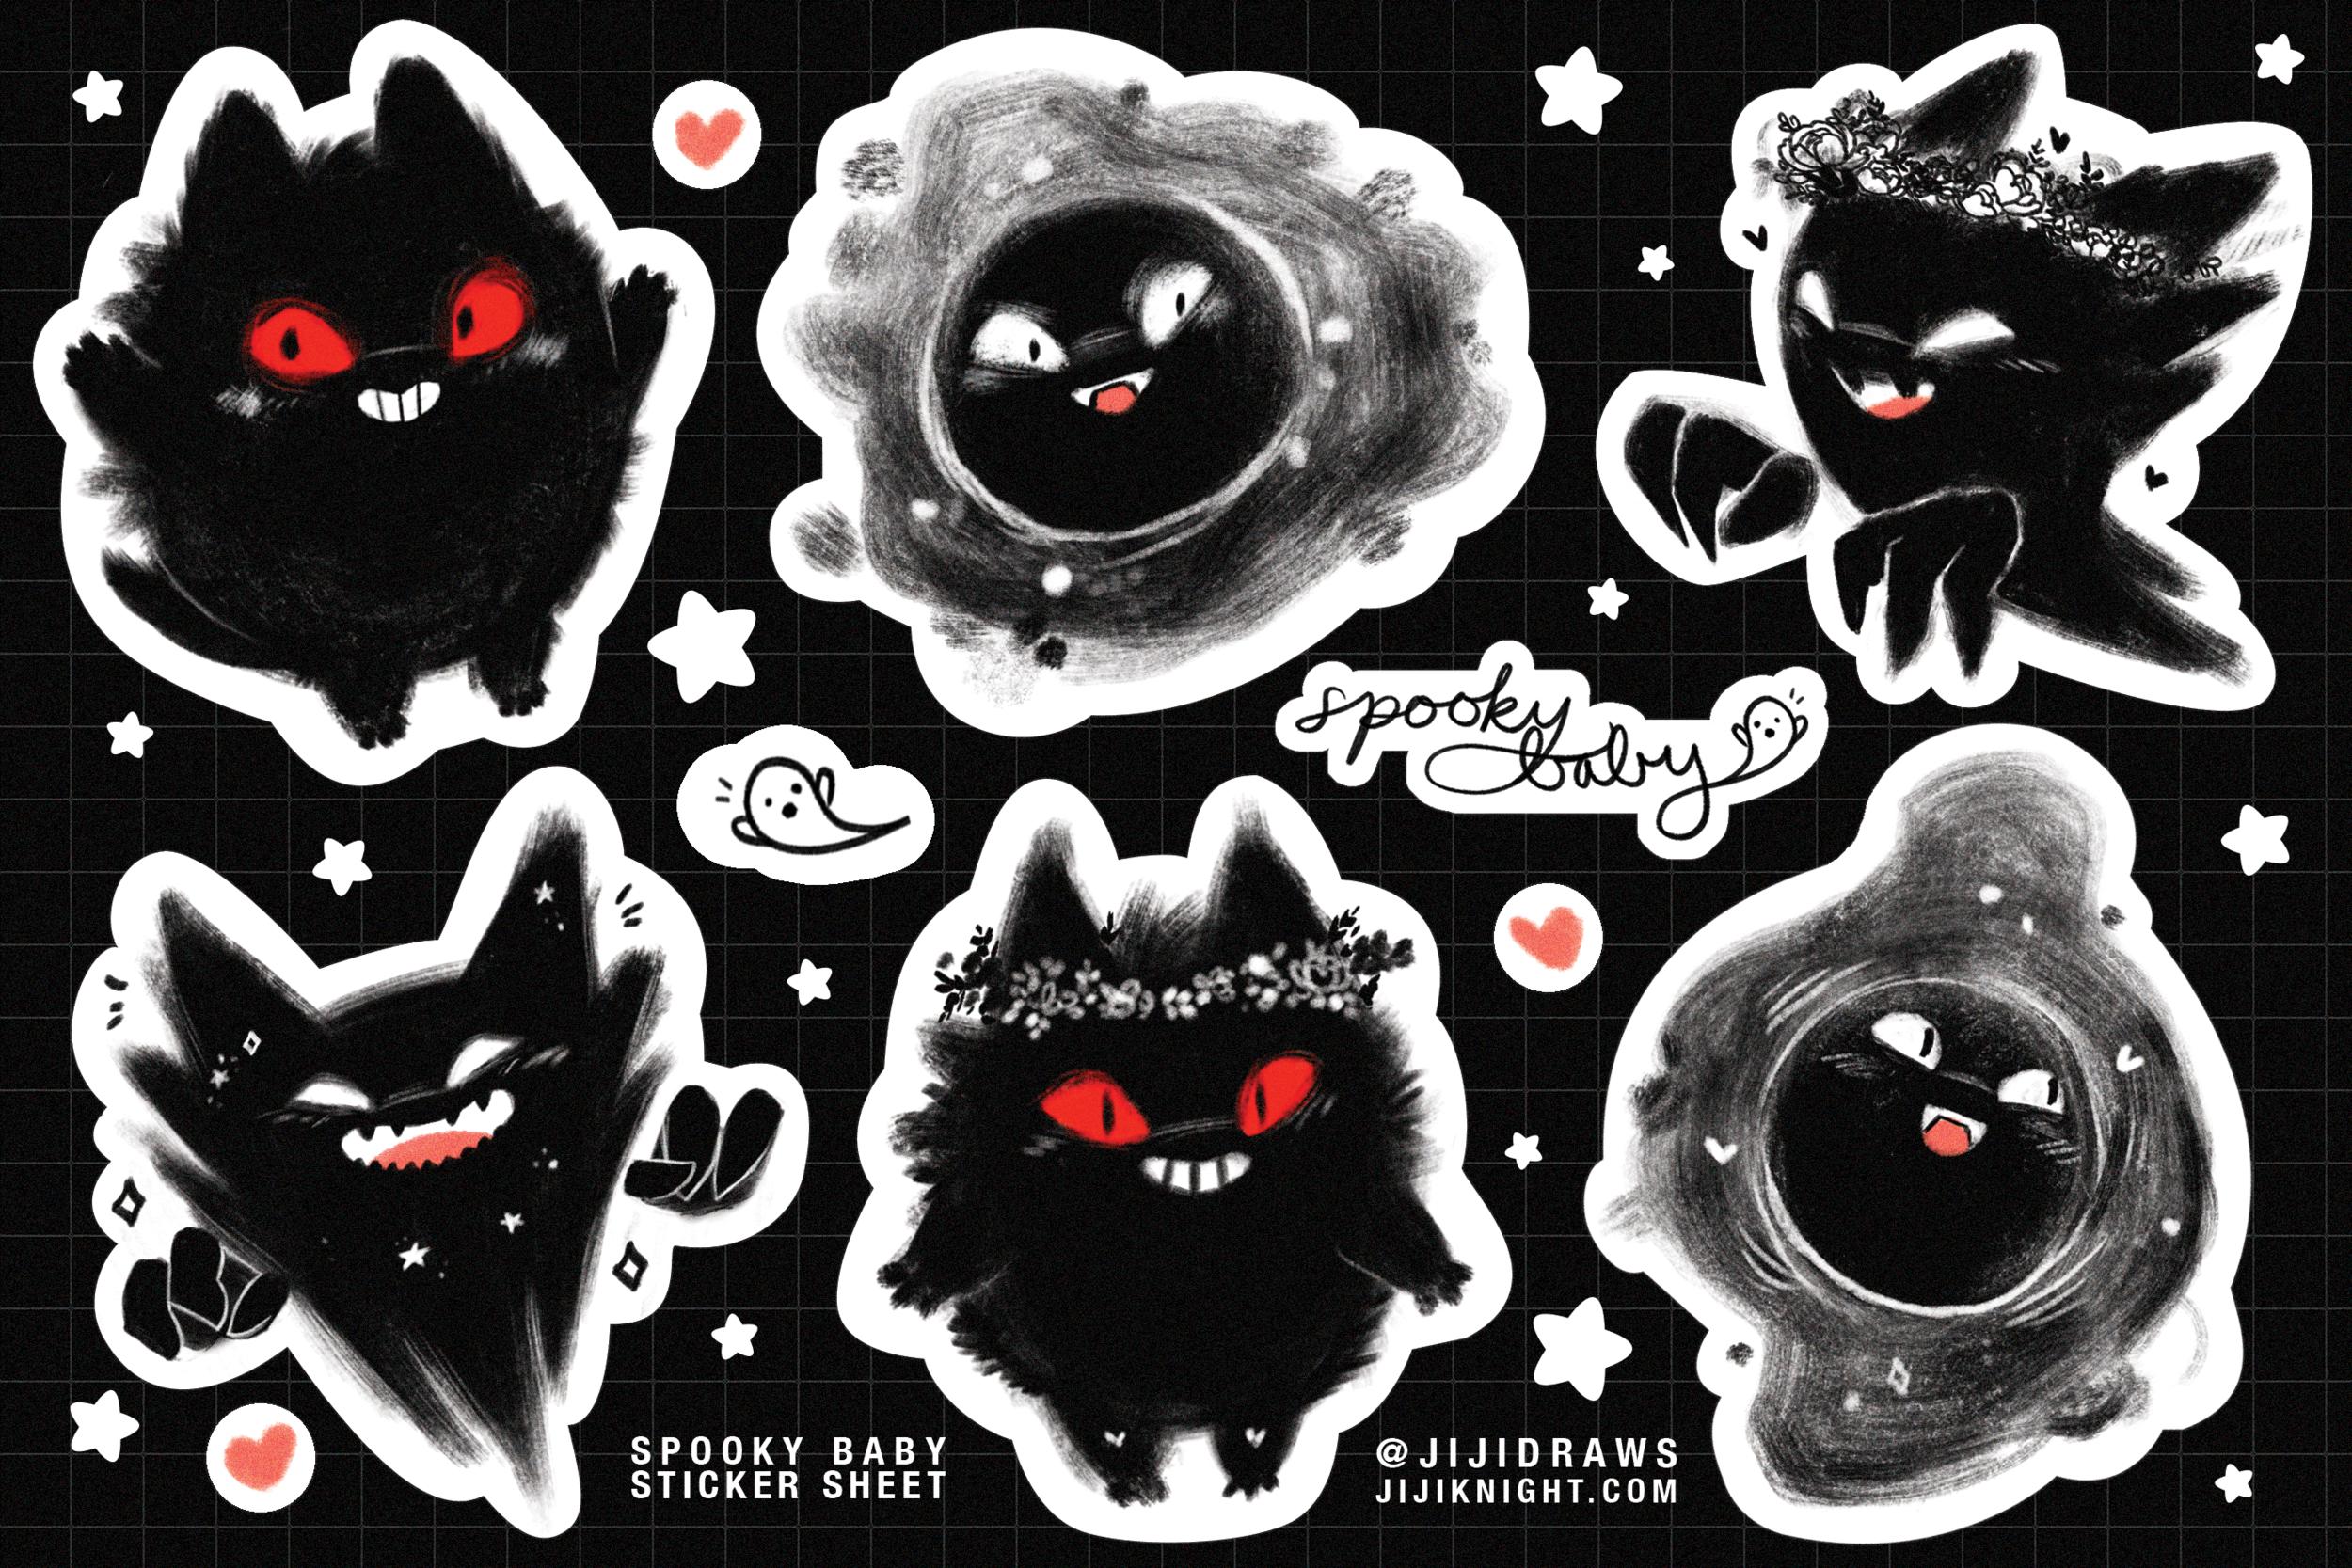 gengar-gastly-haunter-sticker-sheet-pokemon-jijidraws.png